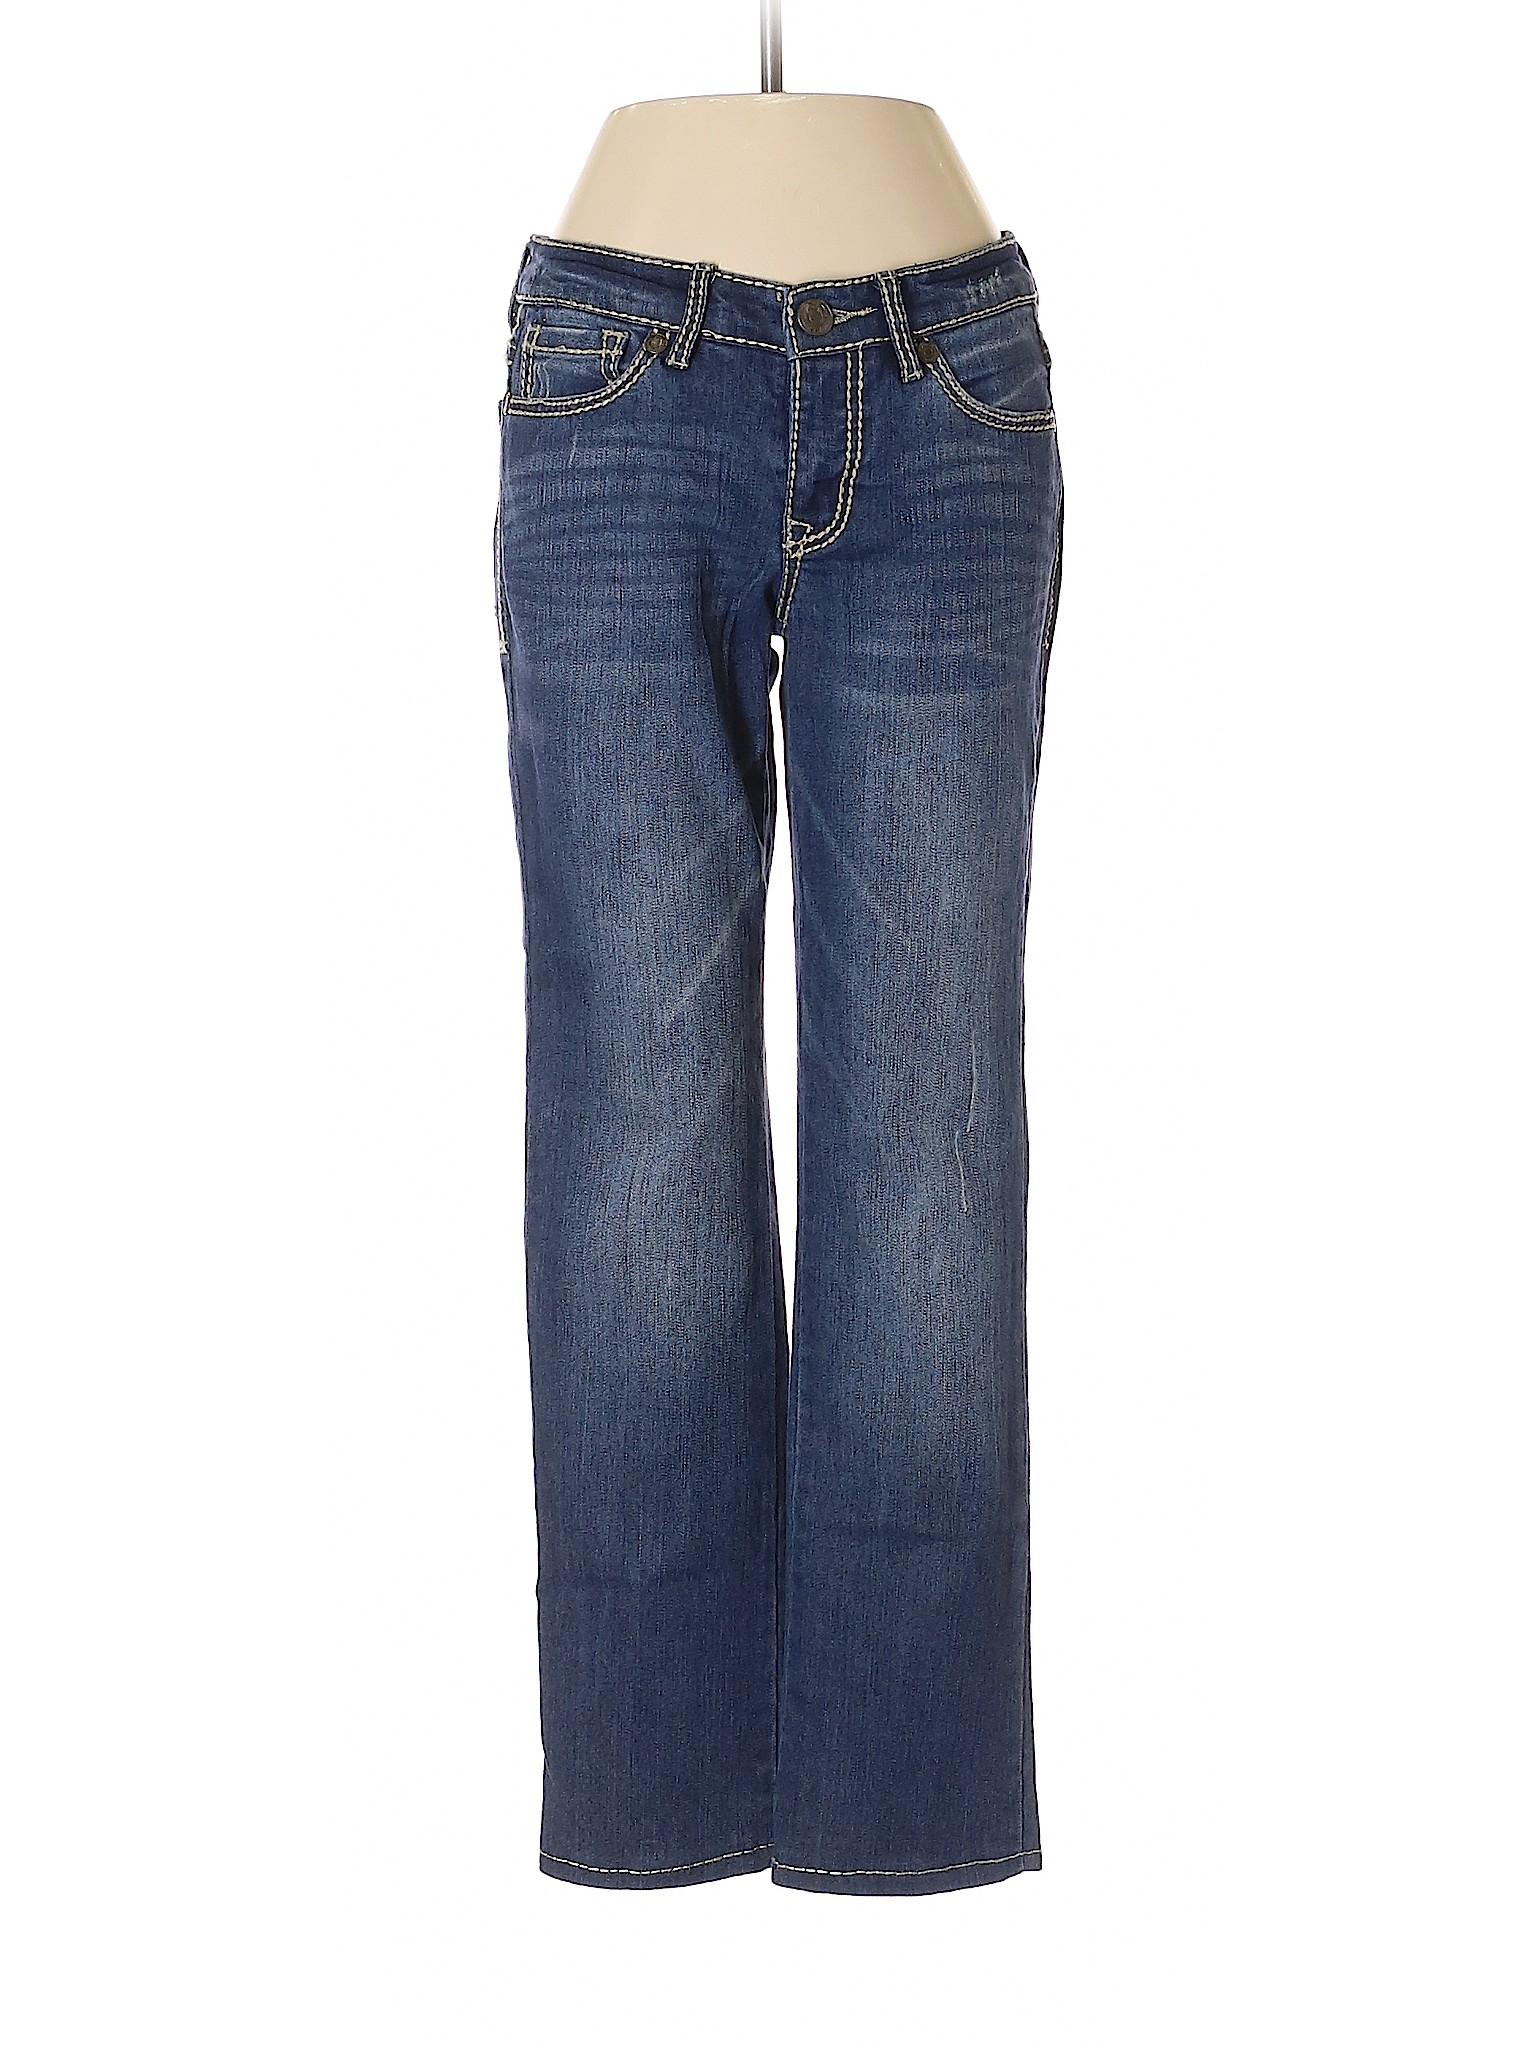 Vintage America Blues Womens Petite Vintage Taper Leg Jean